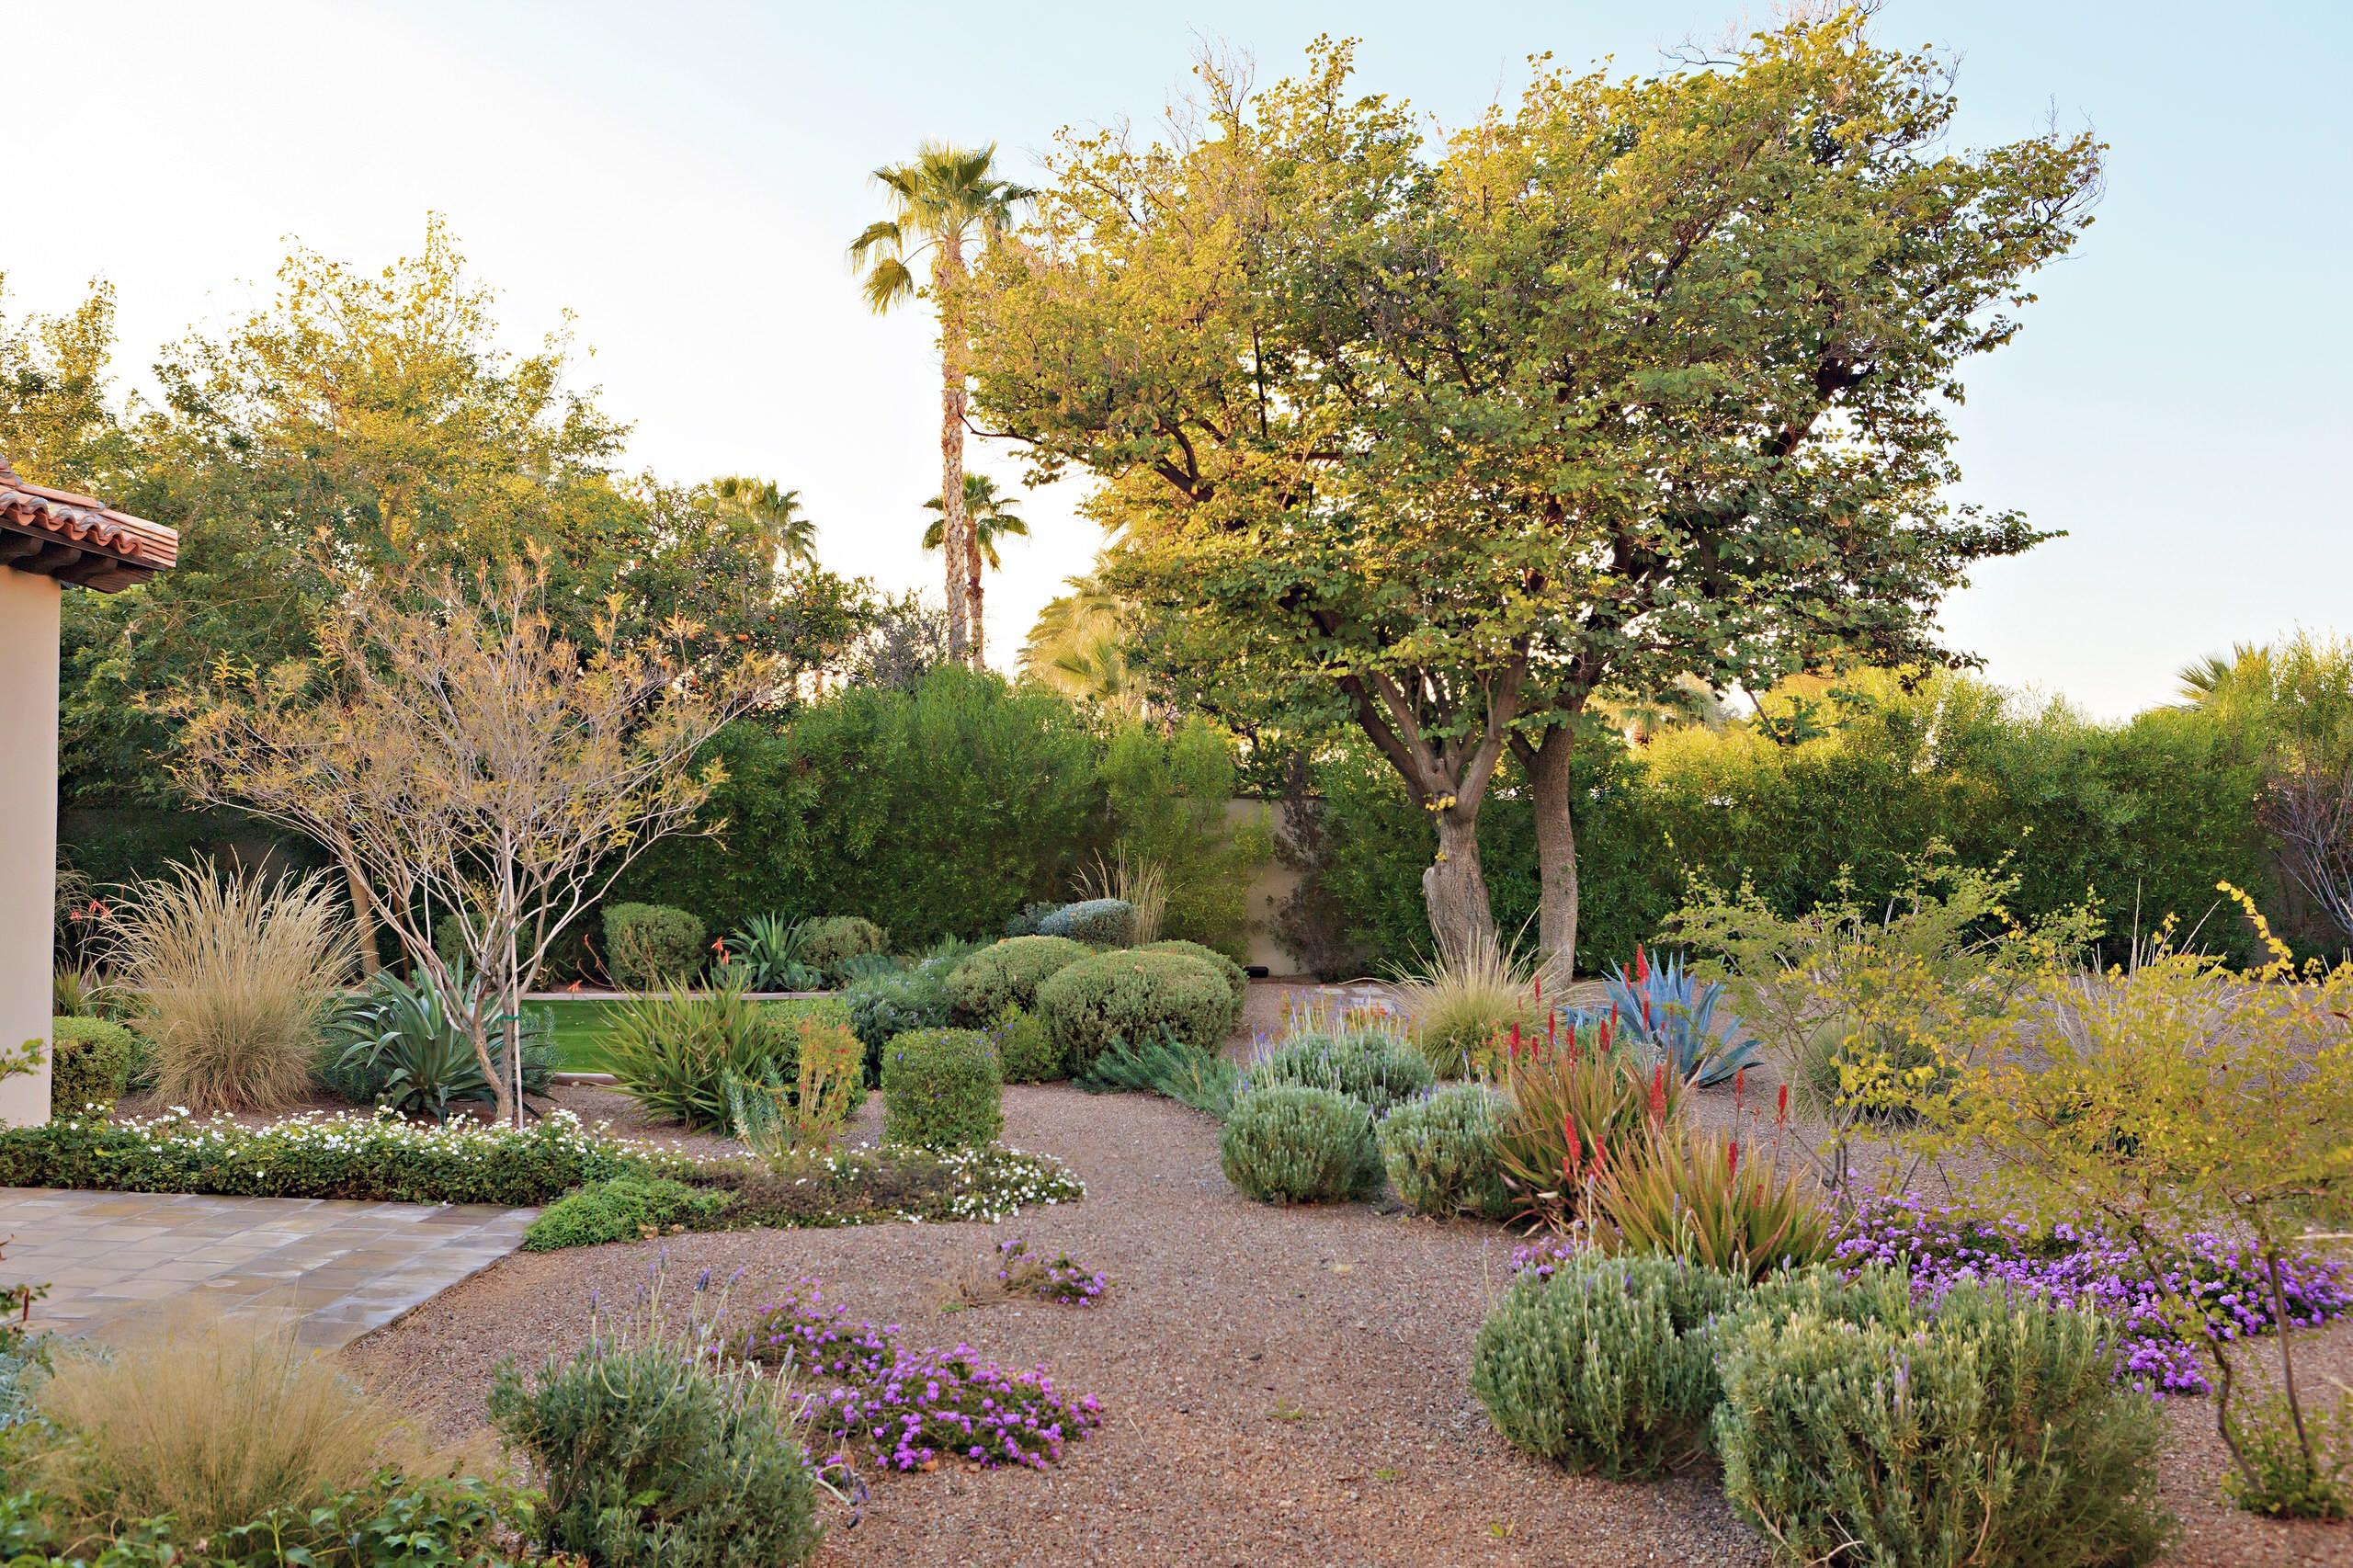 75 Beautiful Desert Backyard Landscaping Pictures Ideas March 2021 Houzz